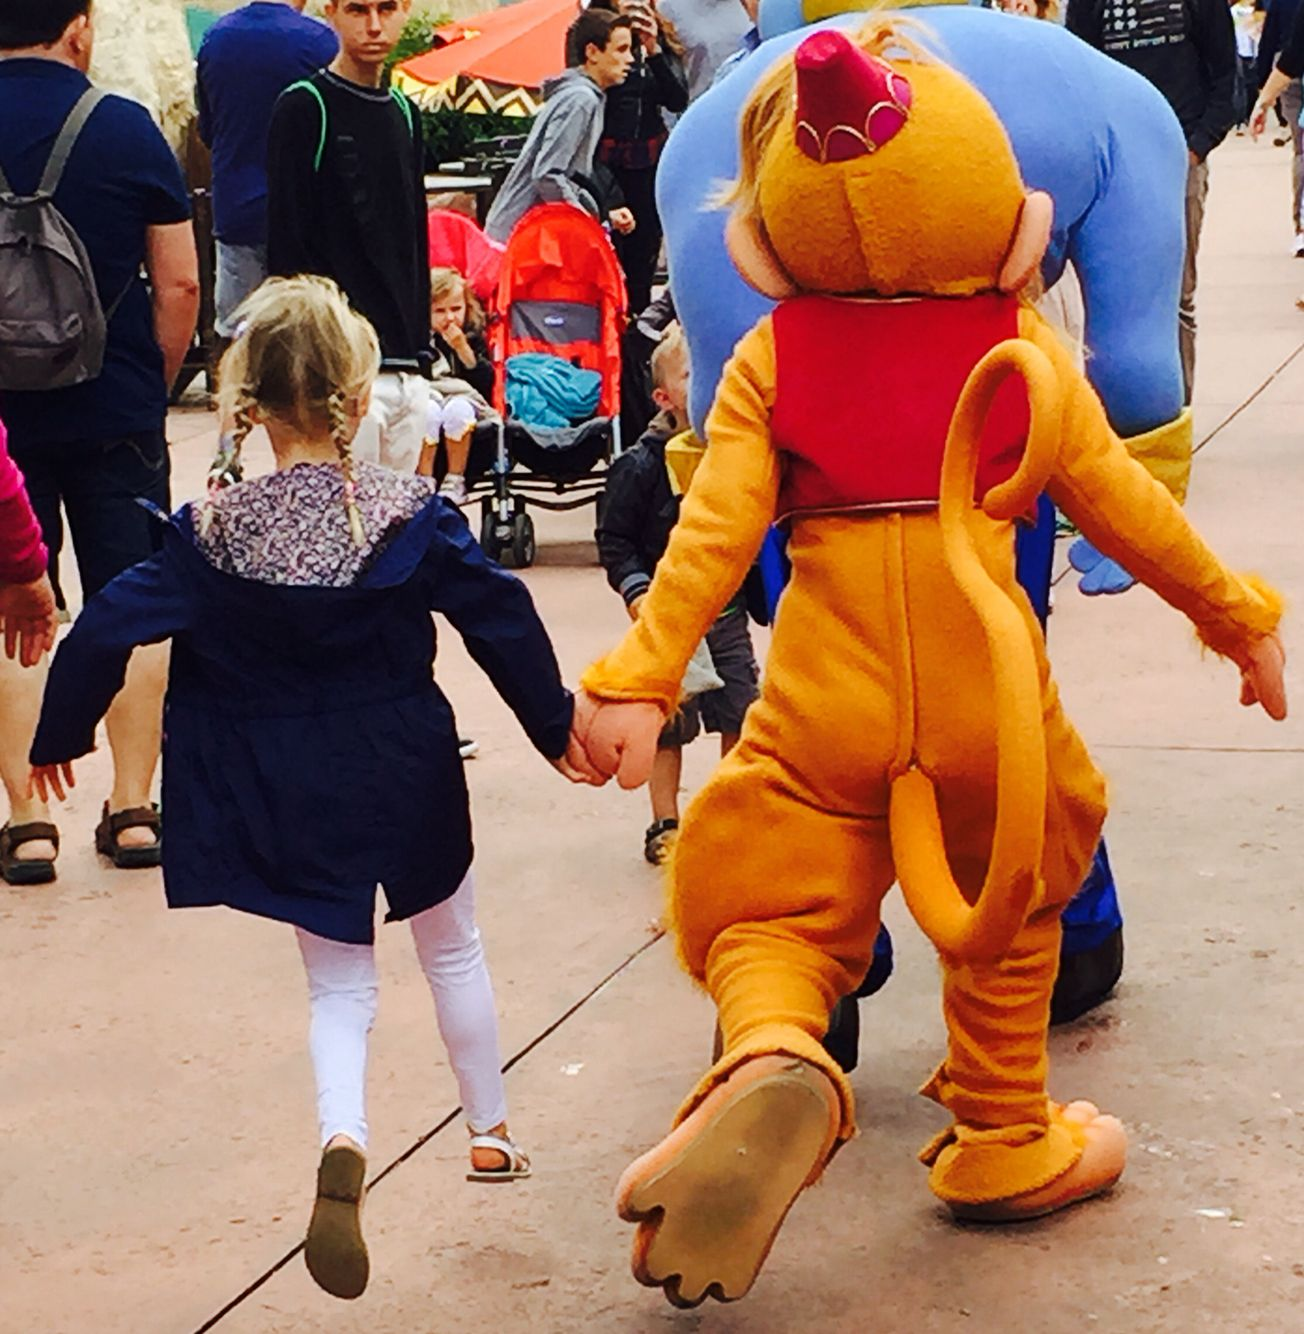 Disneyland Paris 2015 My daughter skipping with Abu. Magical